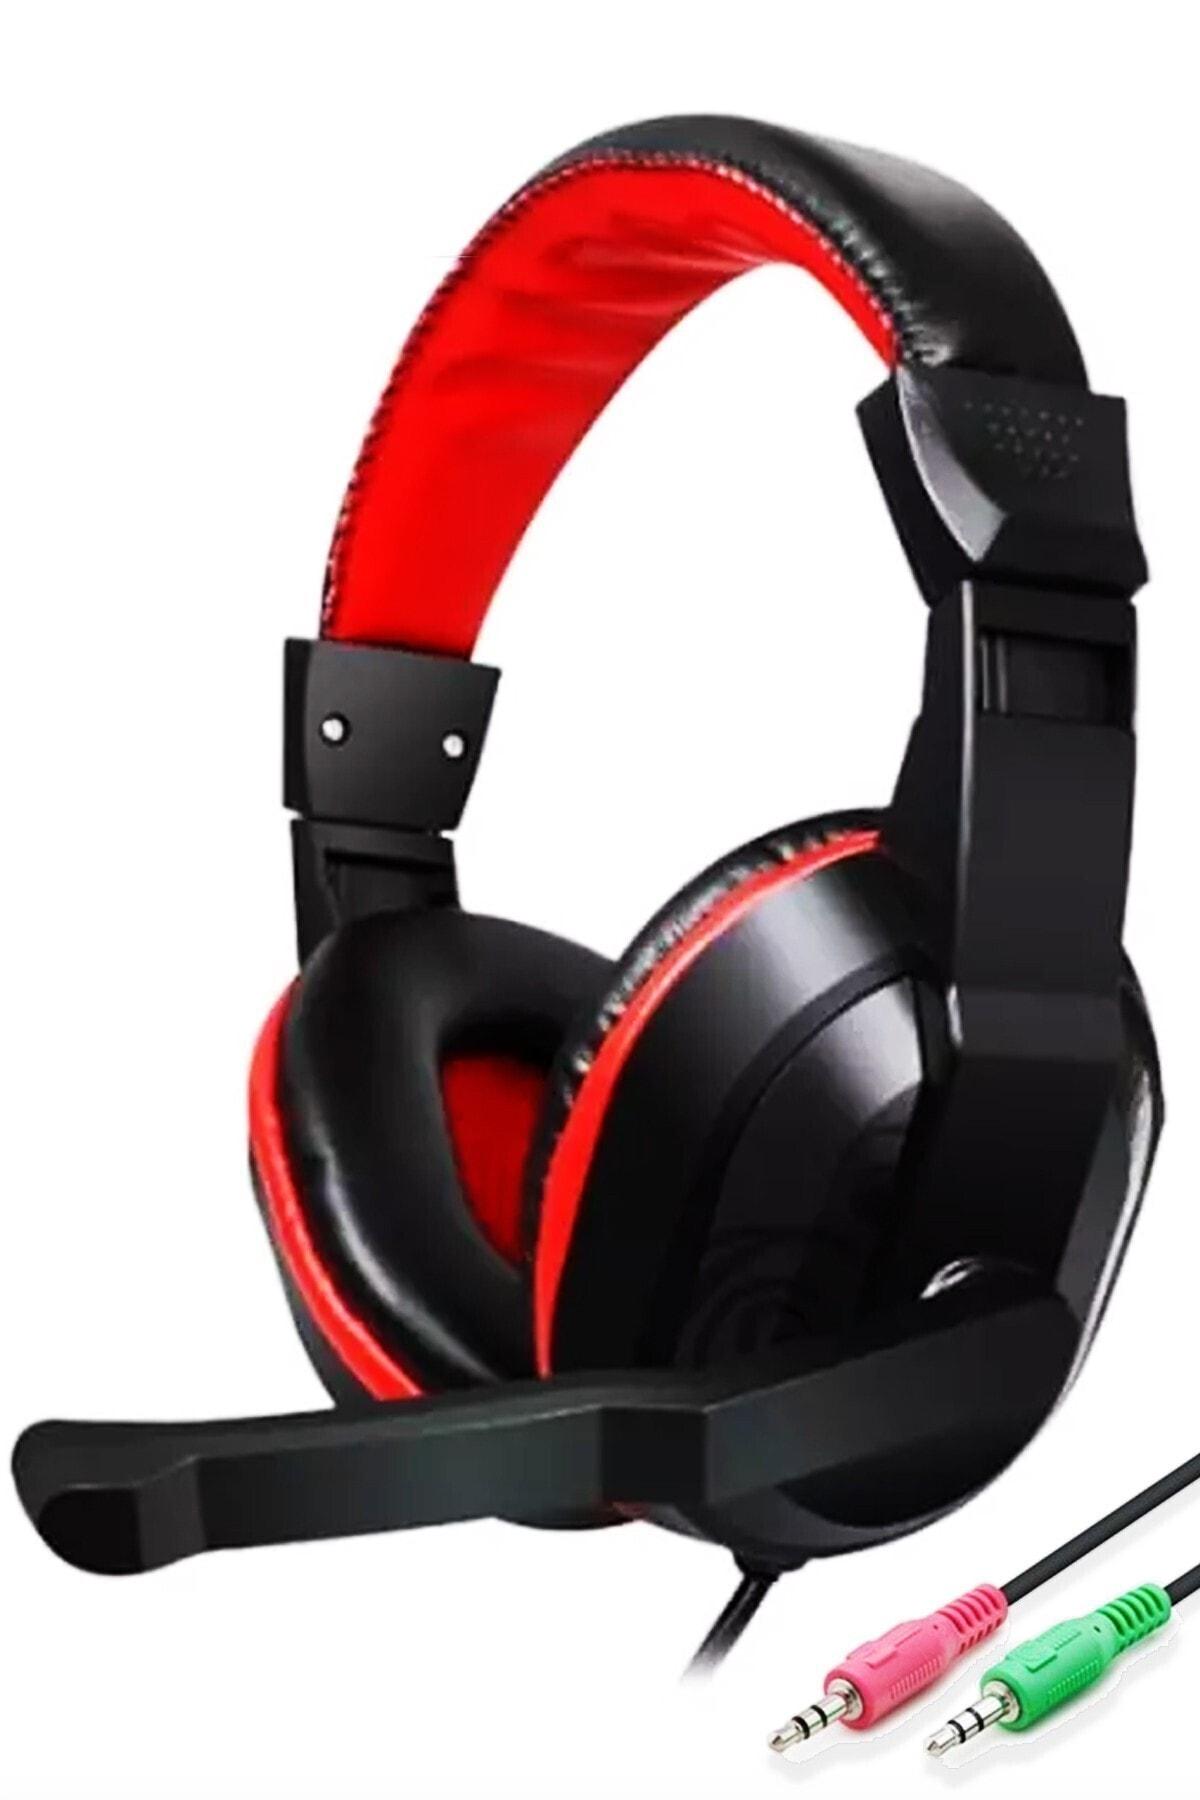 Platoon Pl-2351 Gaming Oyuncu Mikrofonlu Kulaklık 1